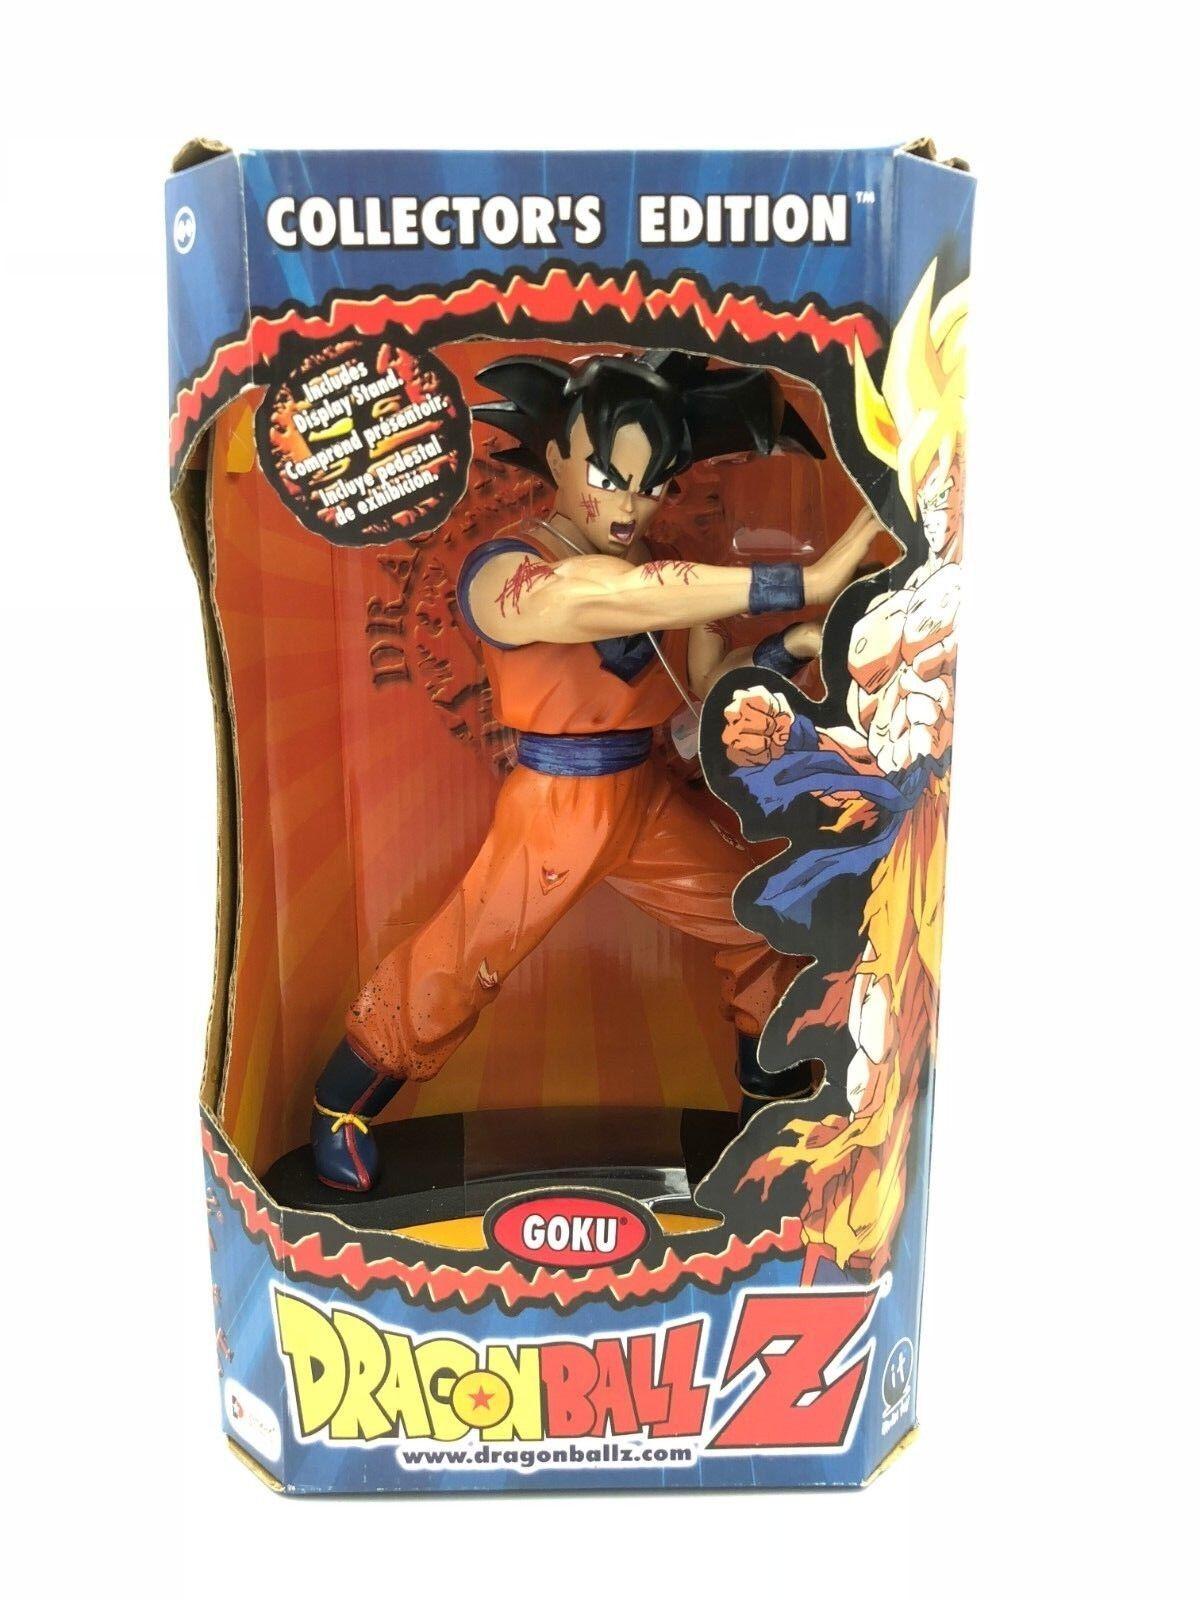 Dragon ball Z GOKU Collector's Edition Irwin Toys 9